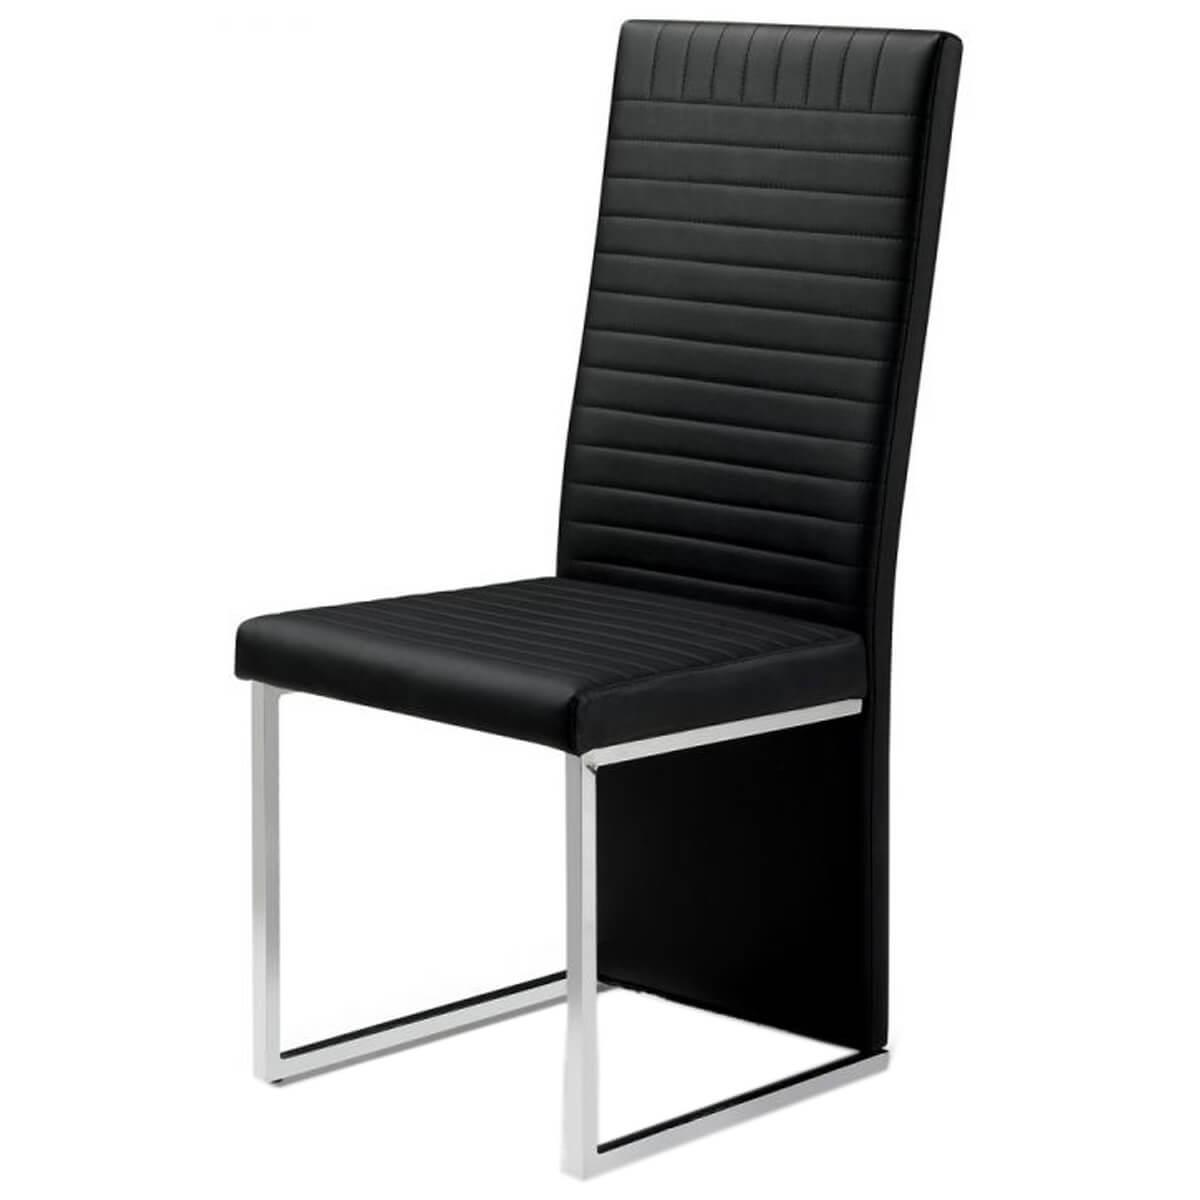 Fritz Hansen Drop Chair Monochrome If in Doubt Blue